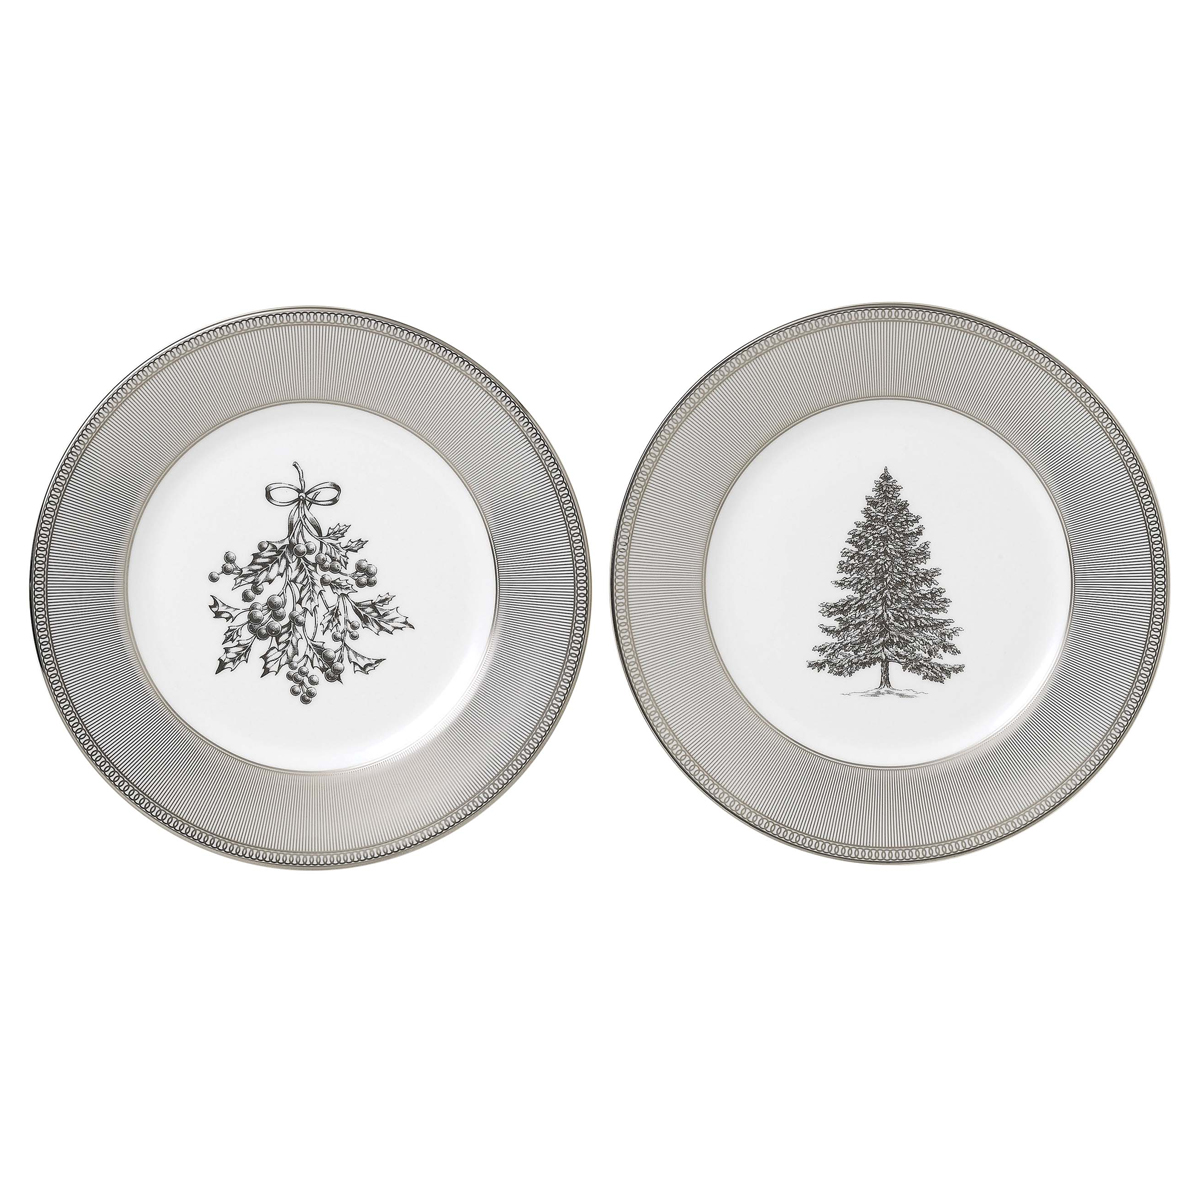 Wedgwood 2020 Winter White Salad Plate Pair